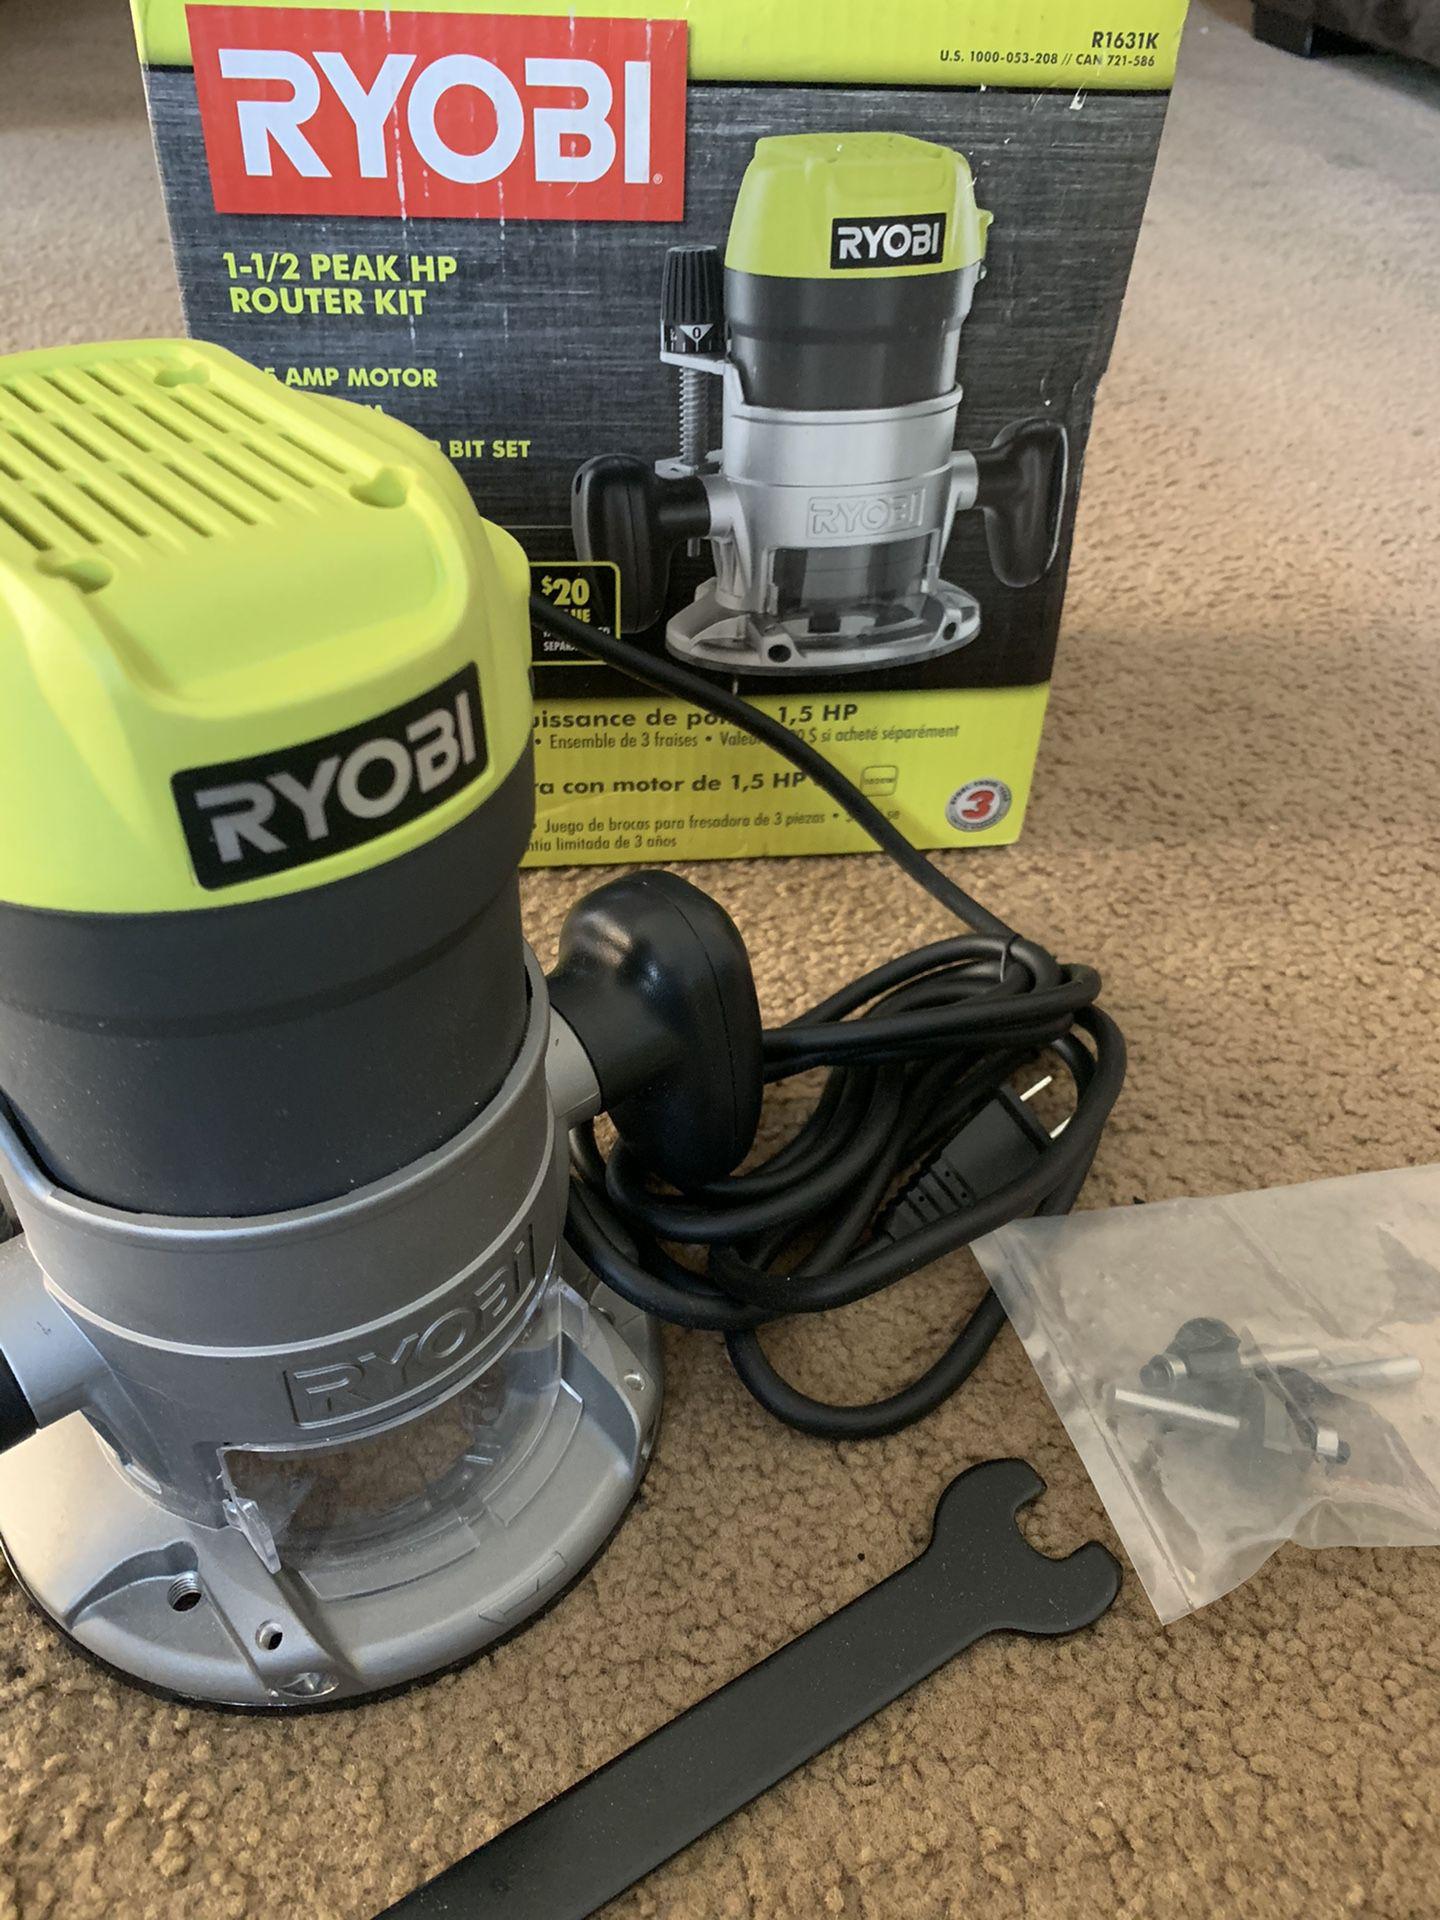 RYOBI 8.5 Amp 1-1/2 Peak HP Fixed Base ROUTER